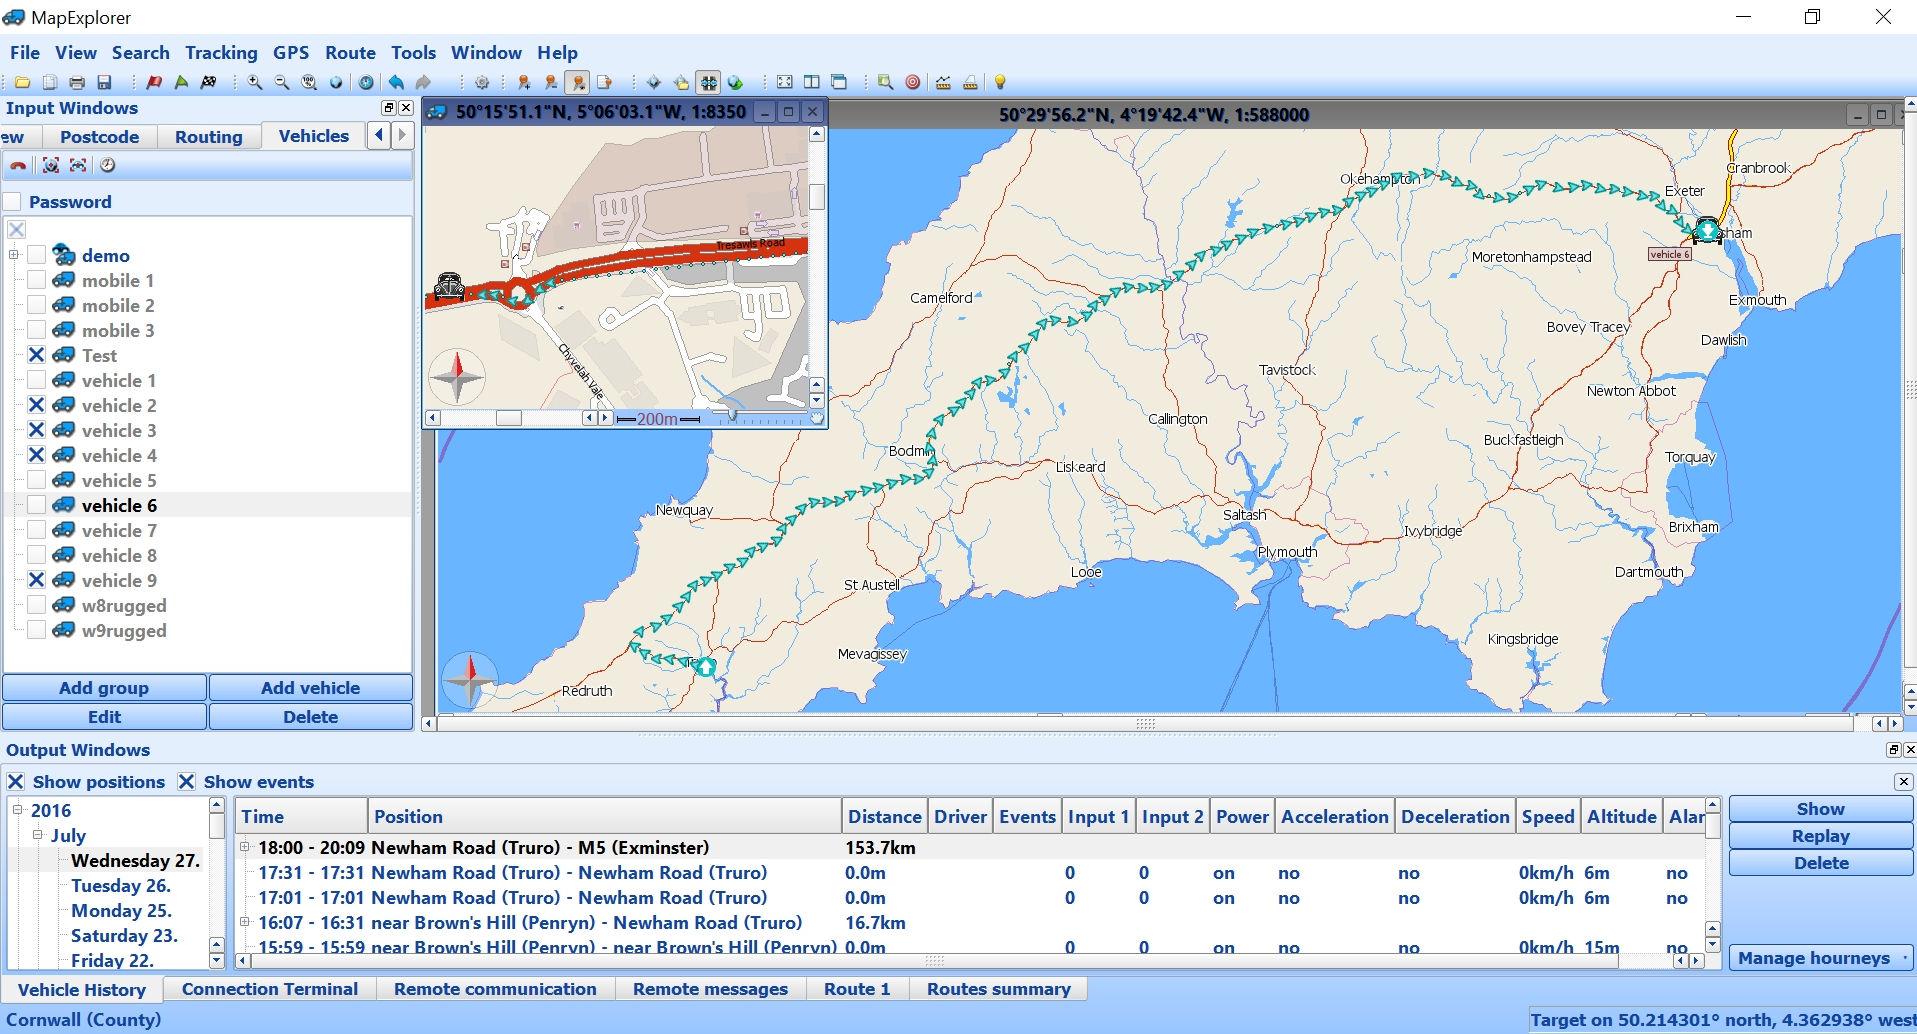 MapExplorer - Screenshot 2